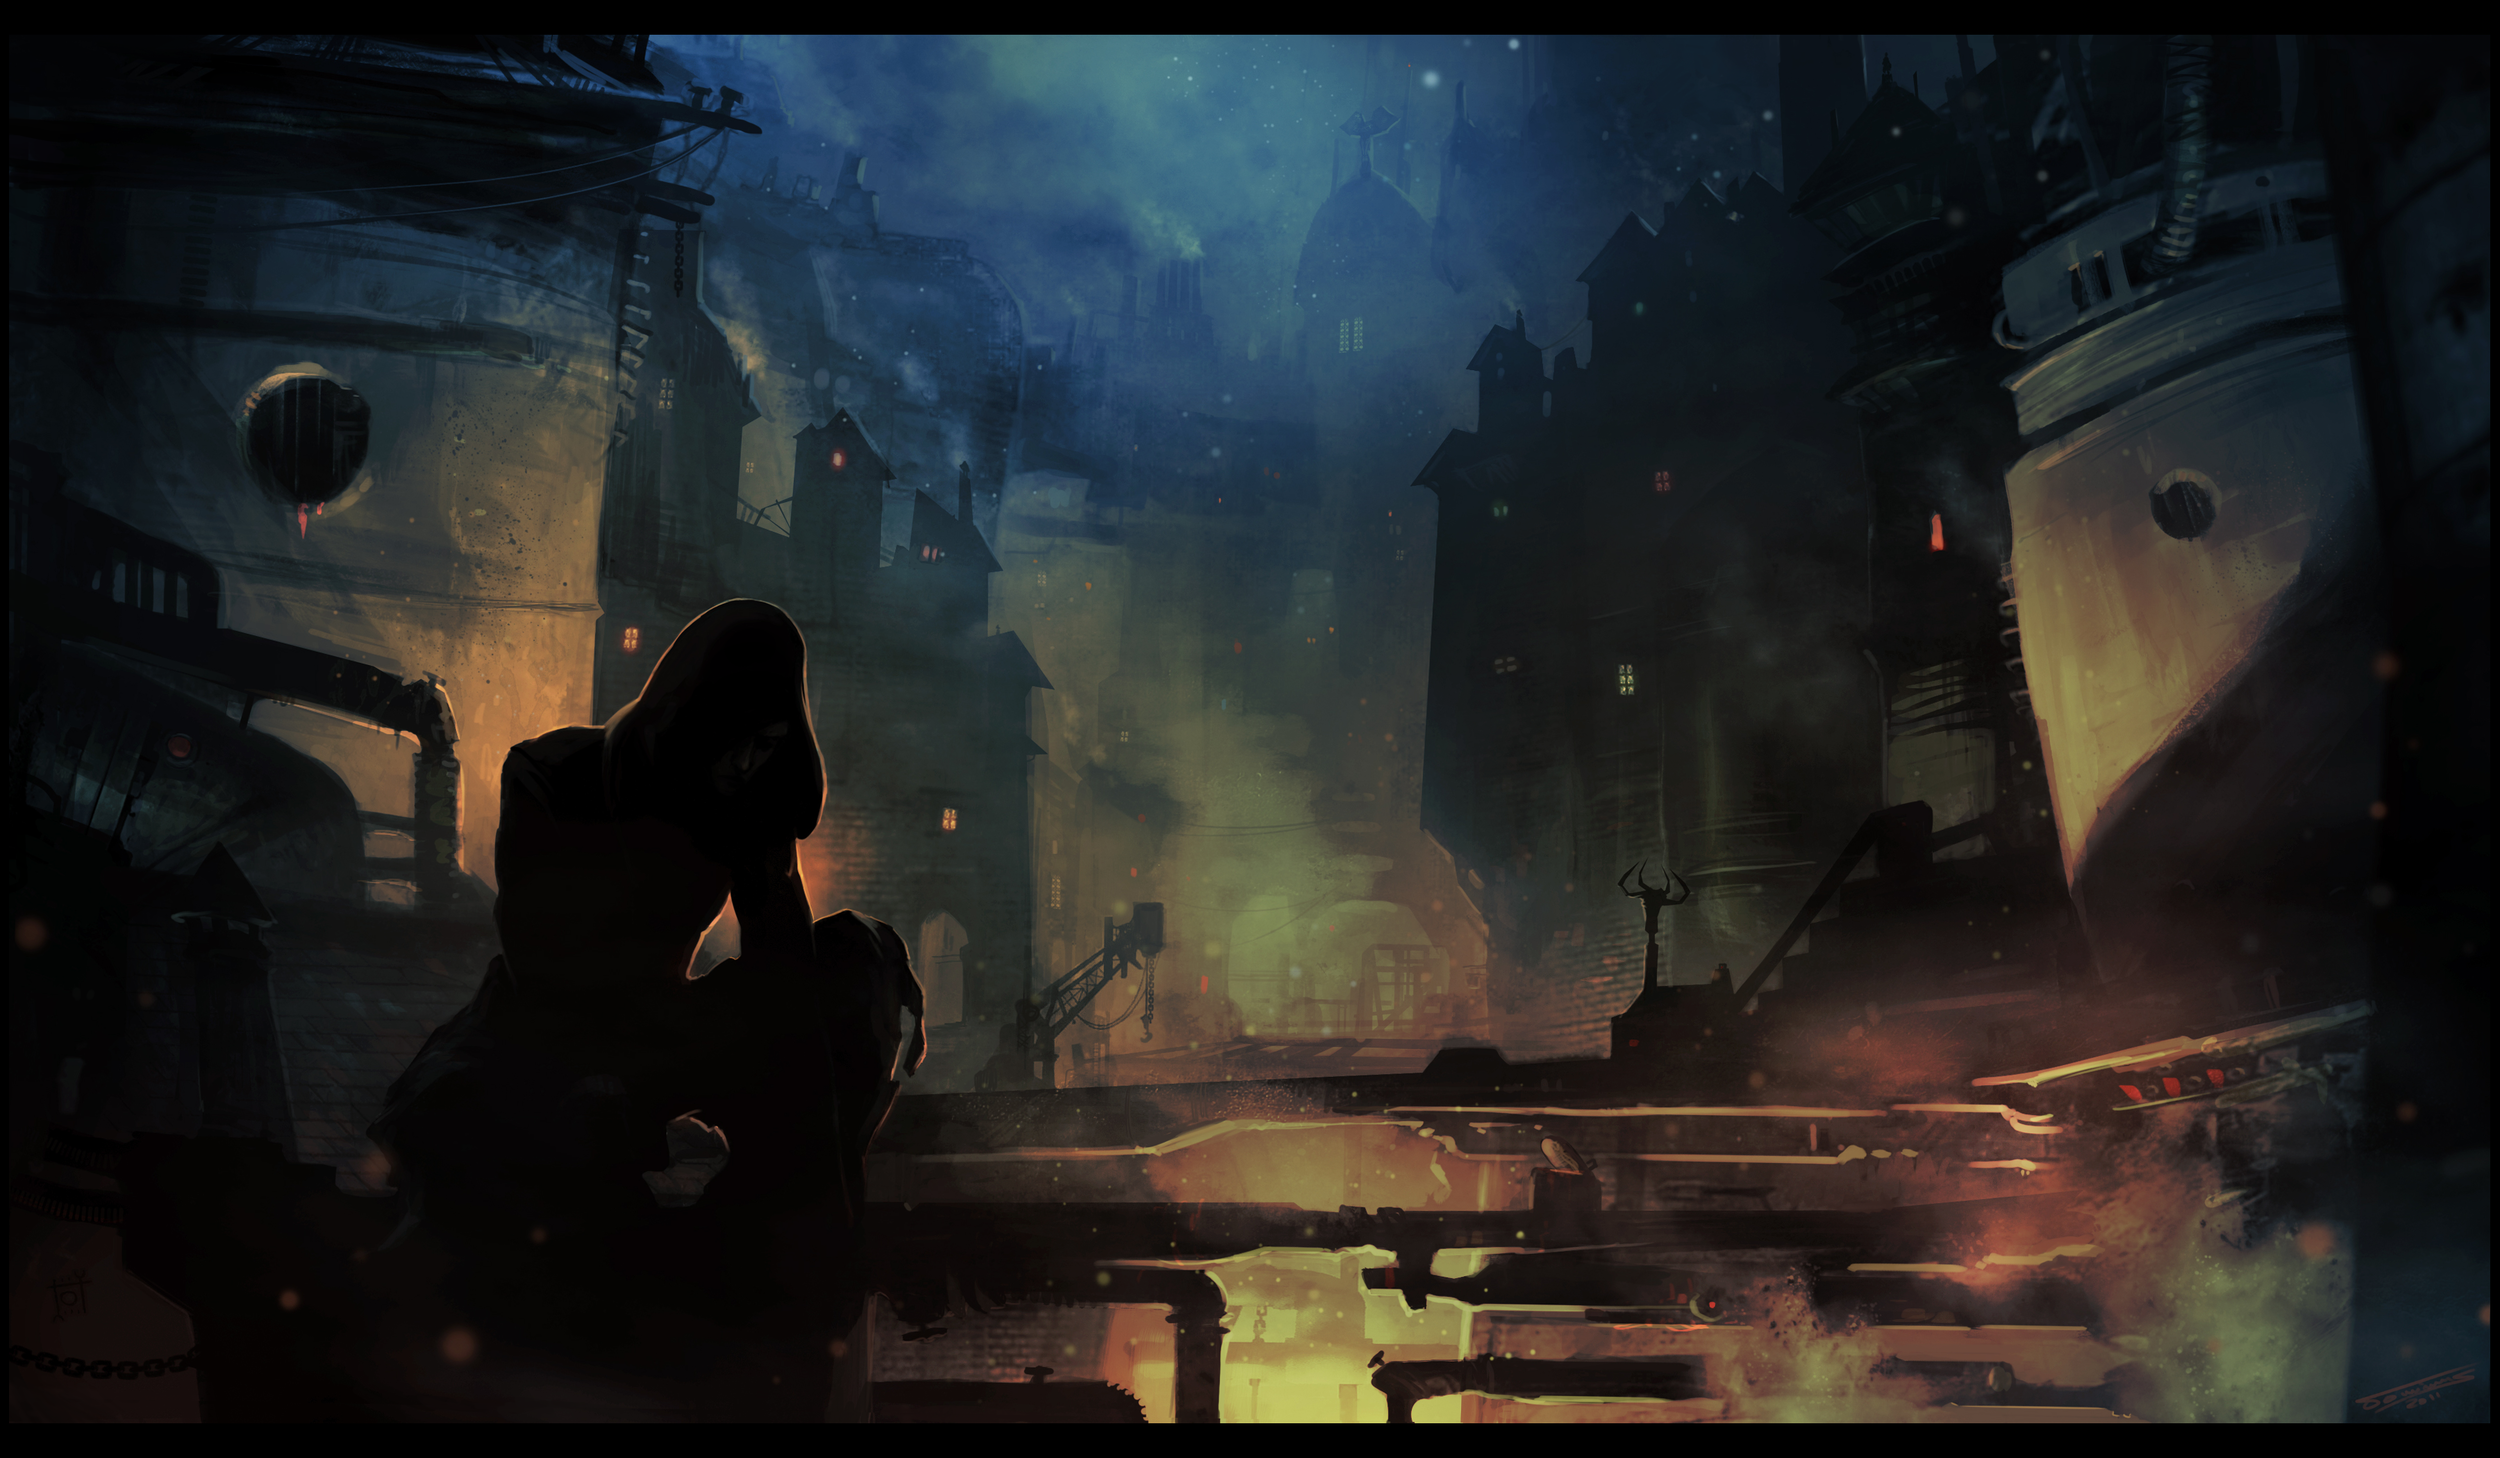 thief-mech-city-final-BIG.png